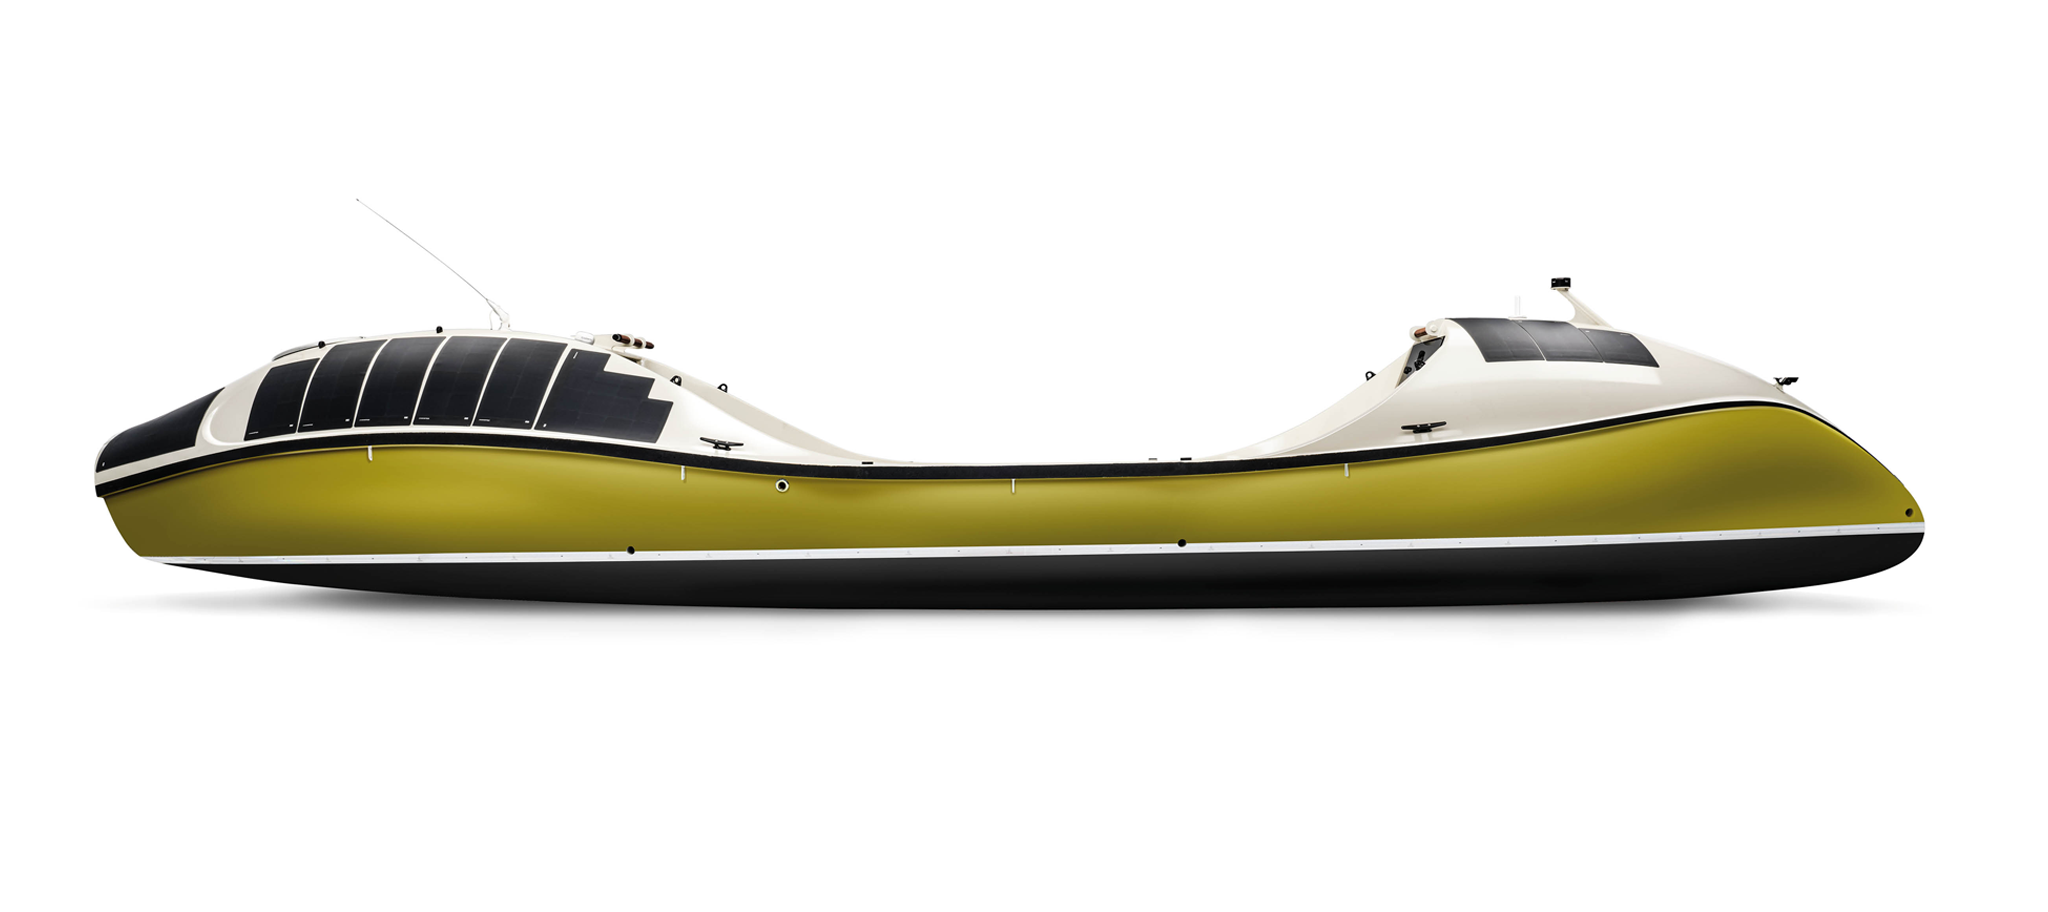 Whaleboat O28 ocean rowing boat side